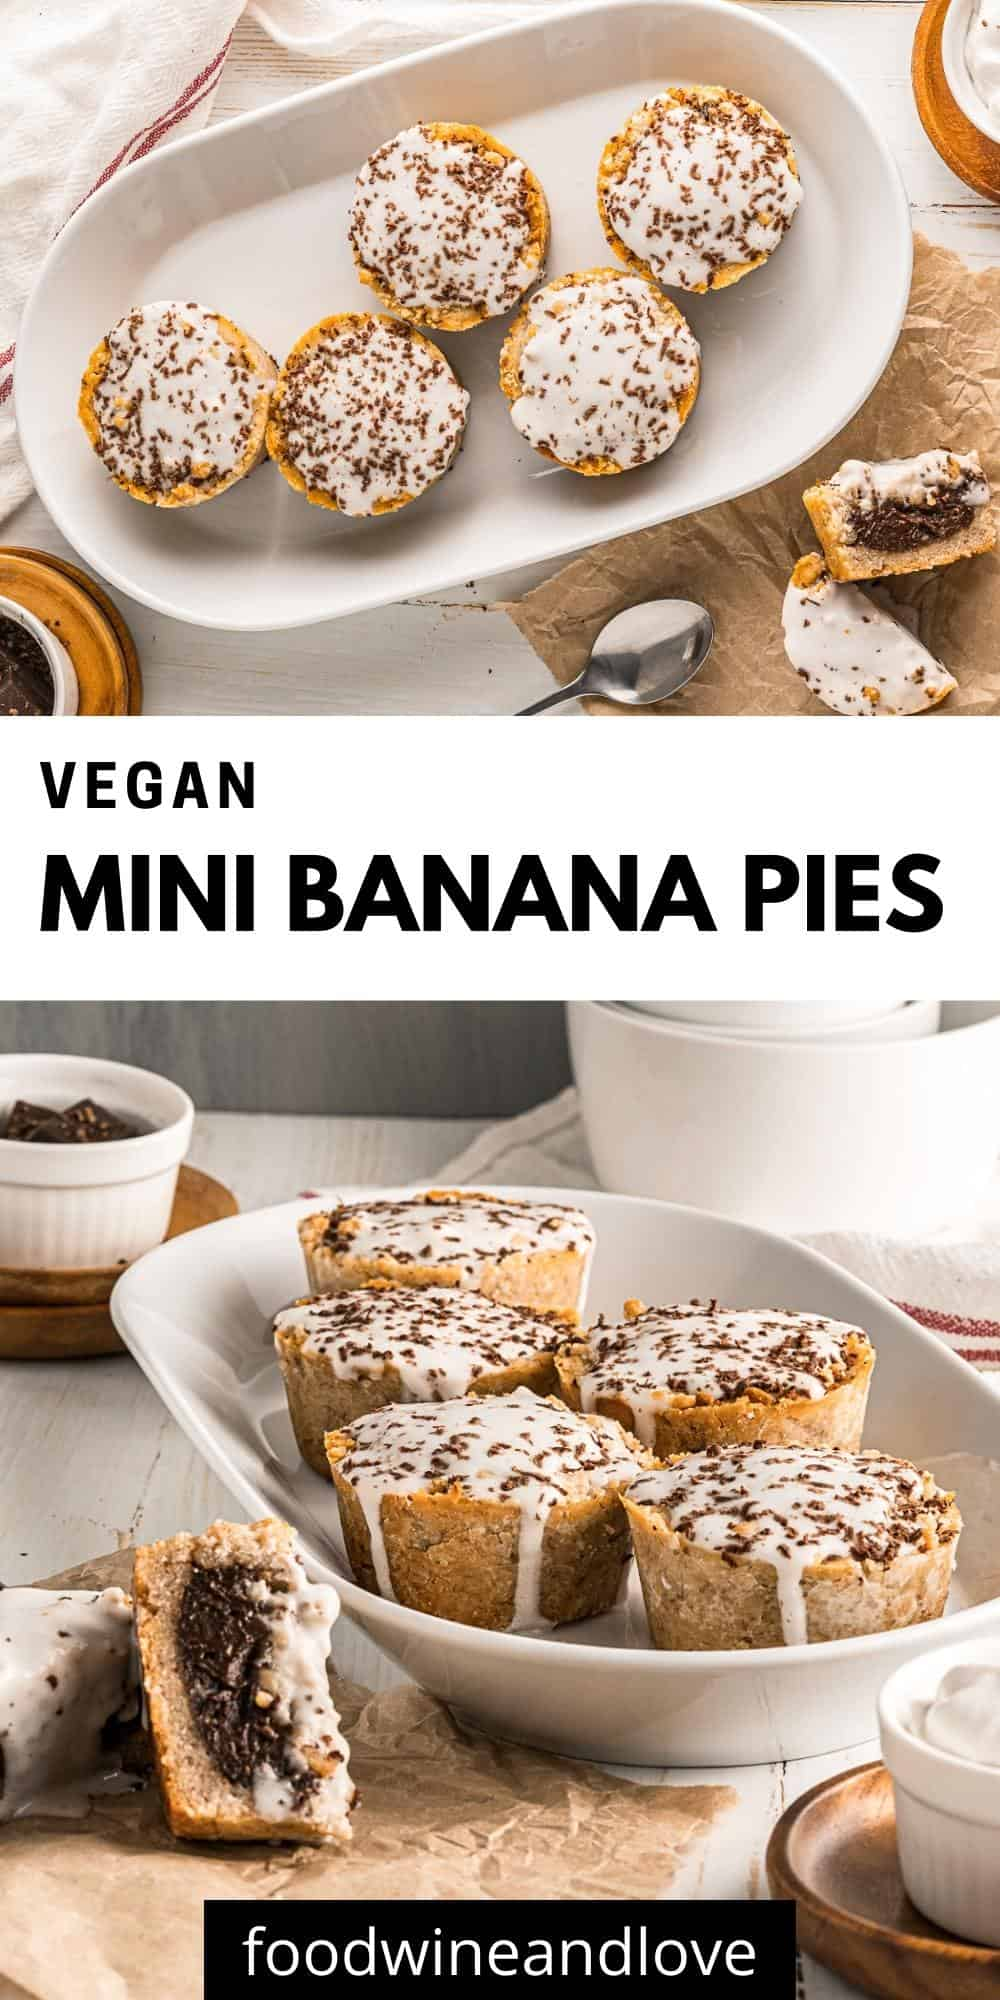 Mini Banana Pies